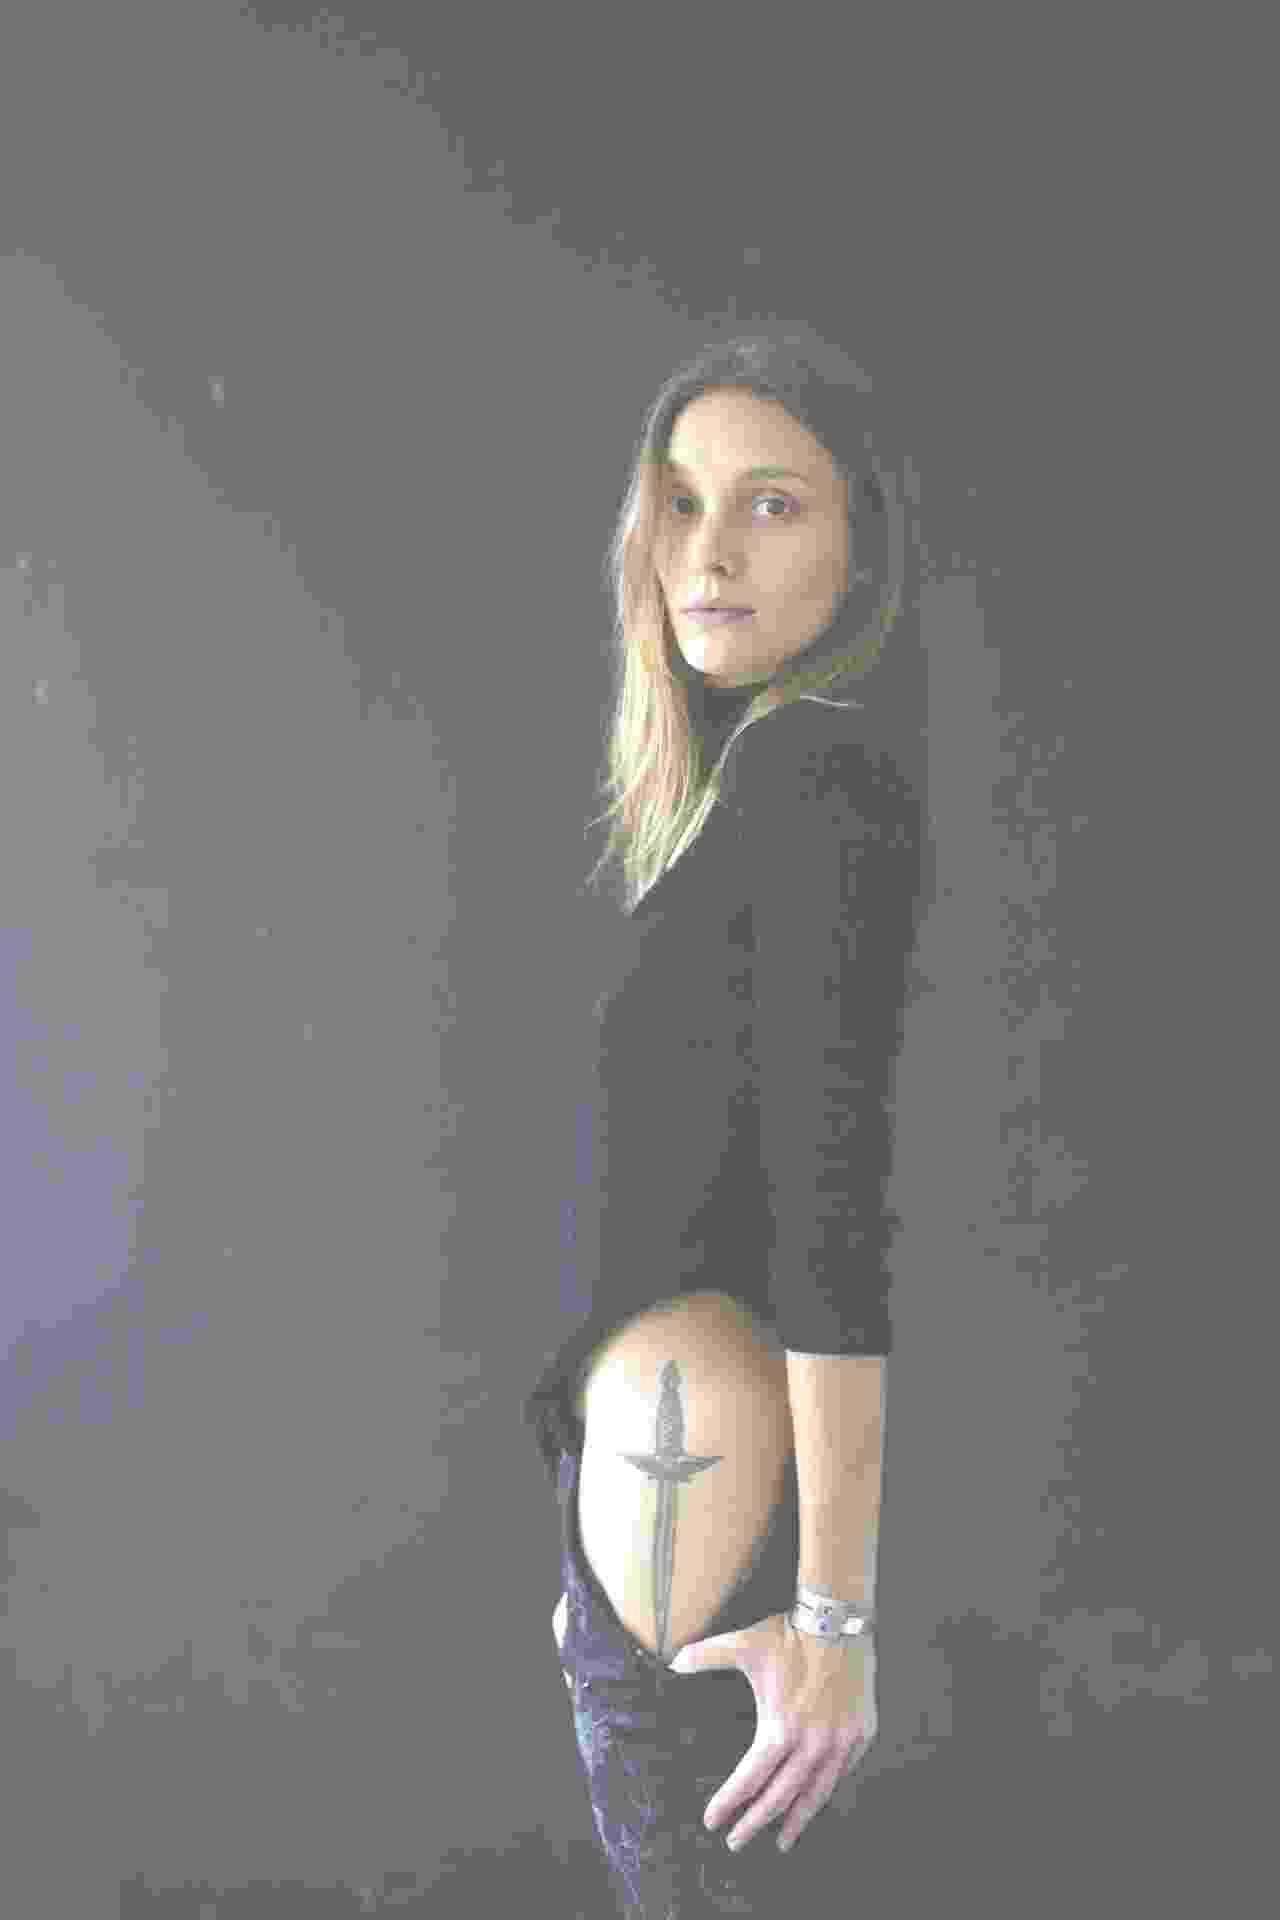 Isabel Hickmann, 29 - Felipe Gabriel/UOL